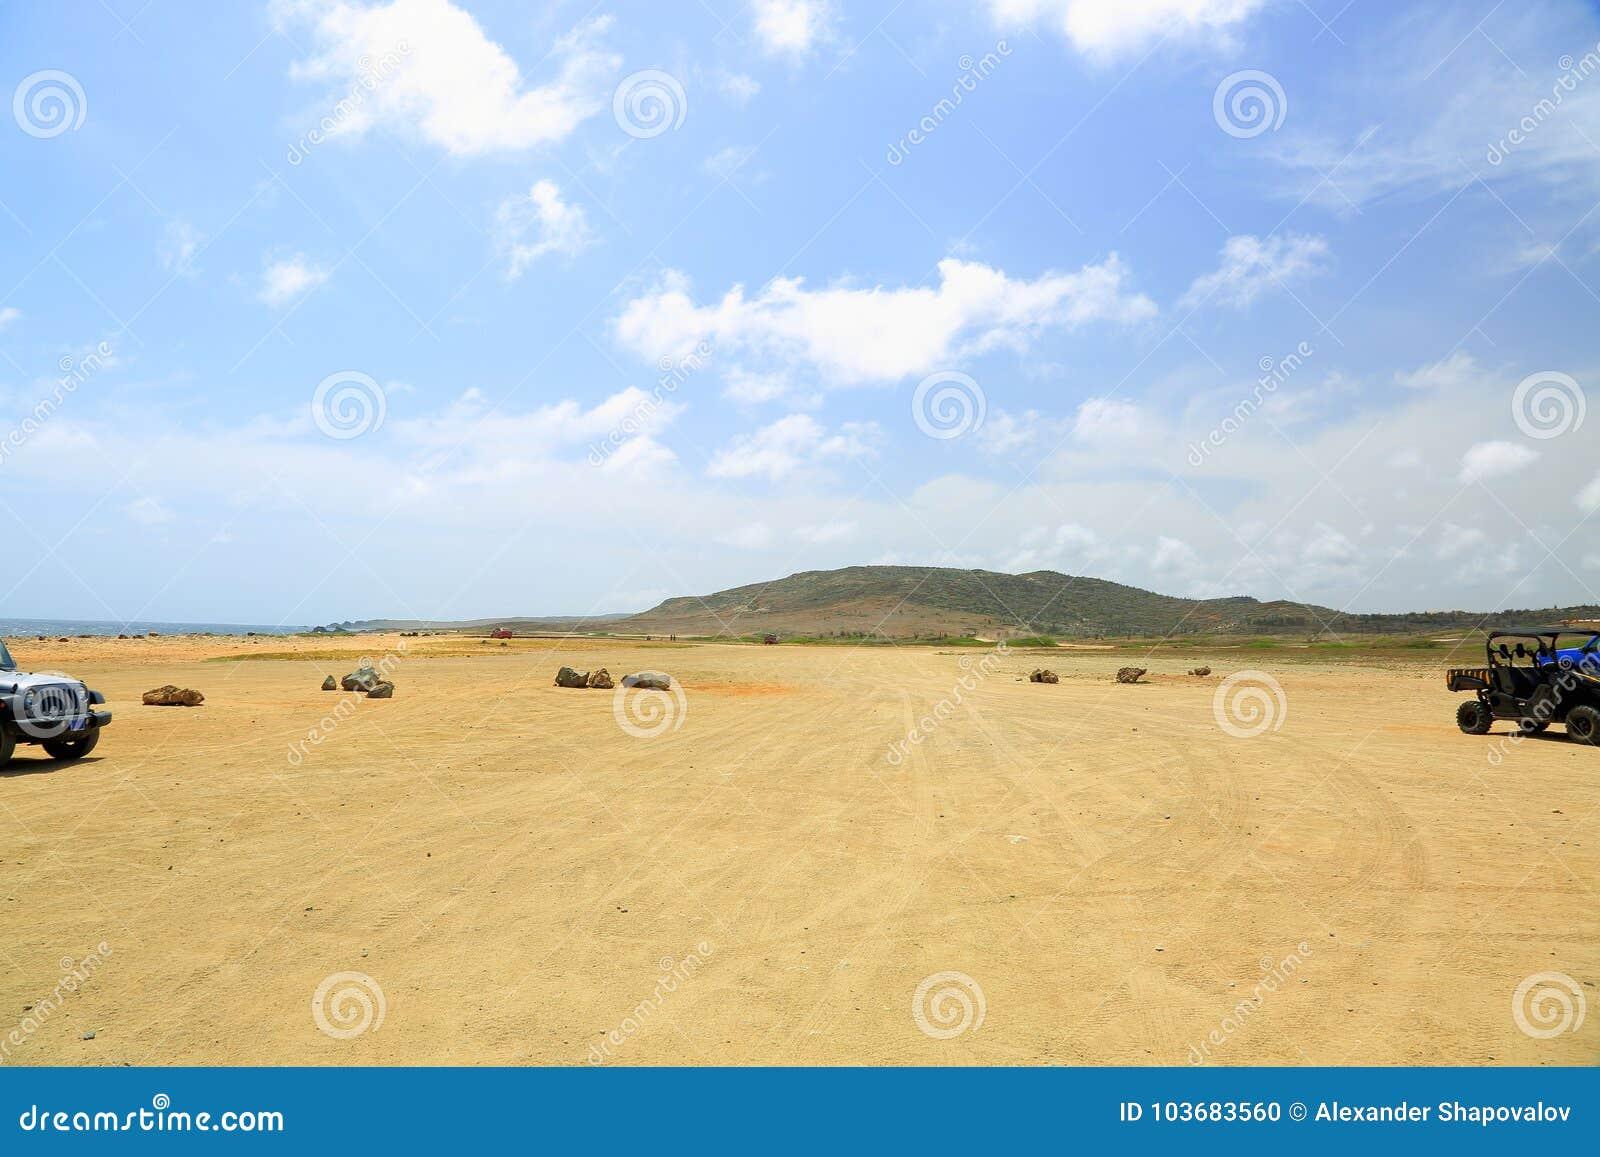 Off-road UTV Aruba tour. Amazing stone desert landscape and blue sky